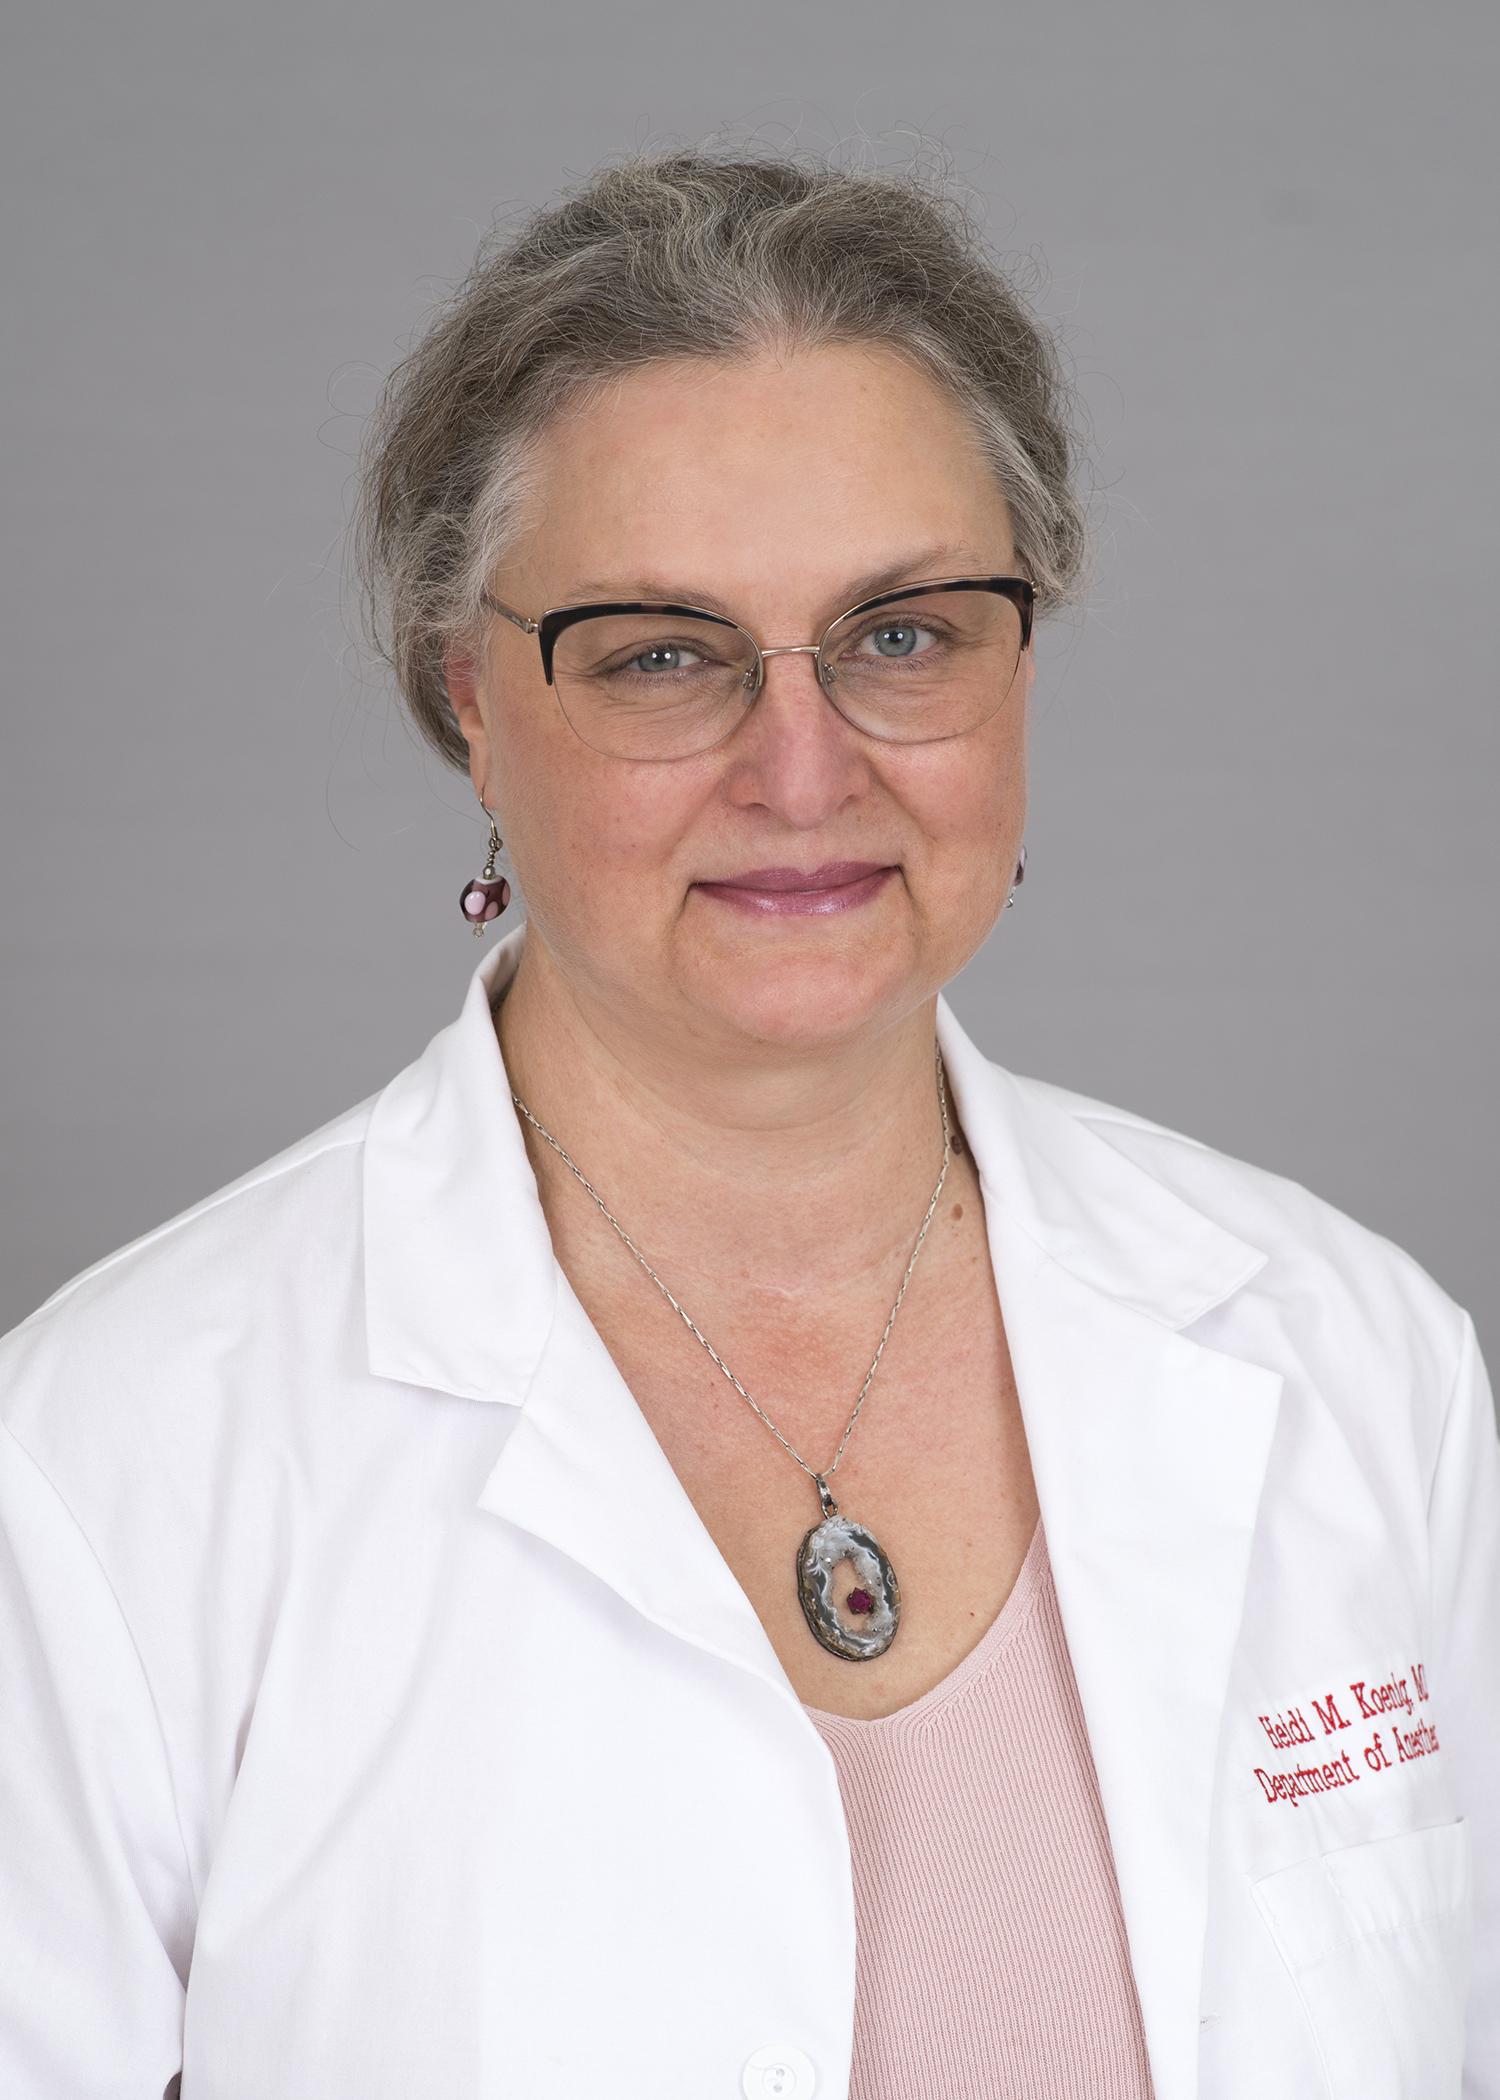 Dr. Heidi Koenig